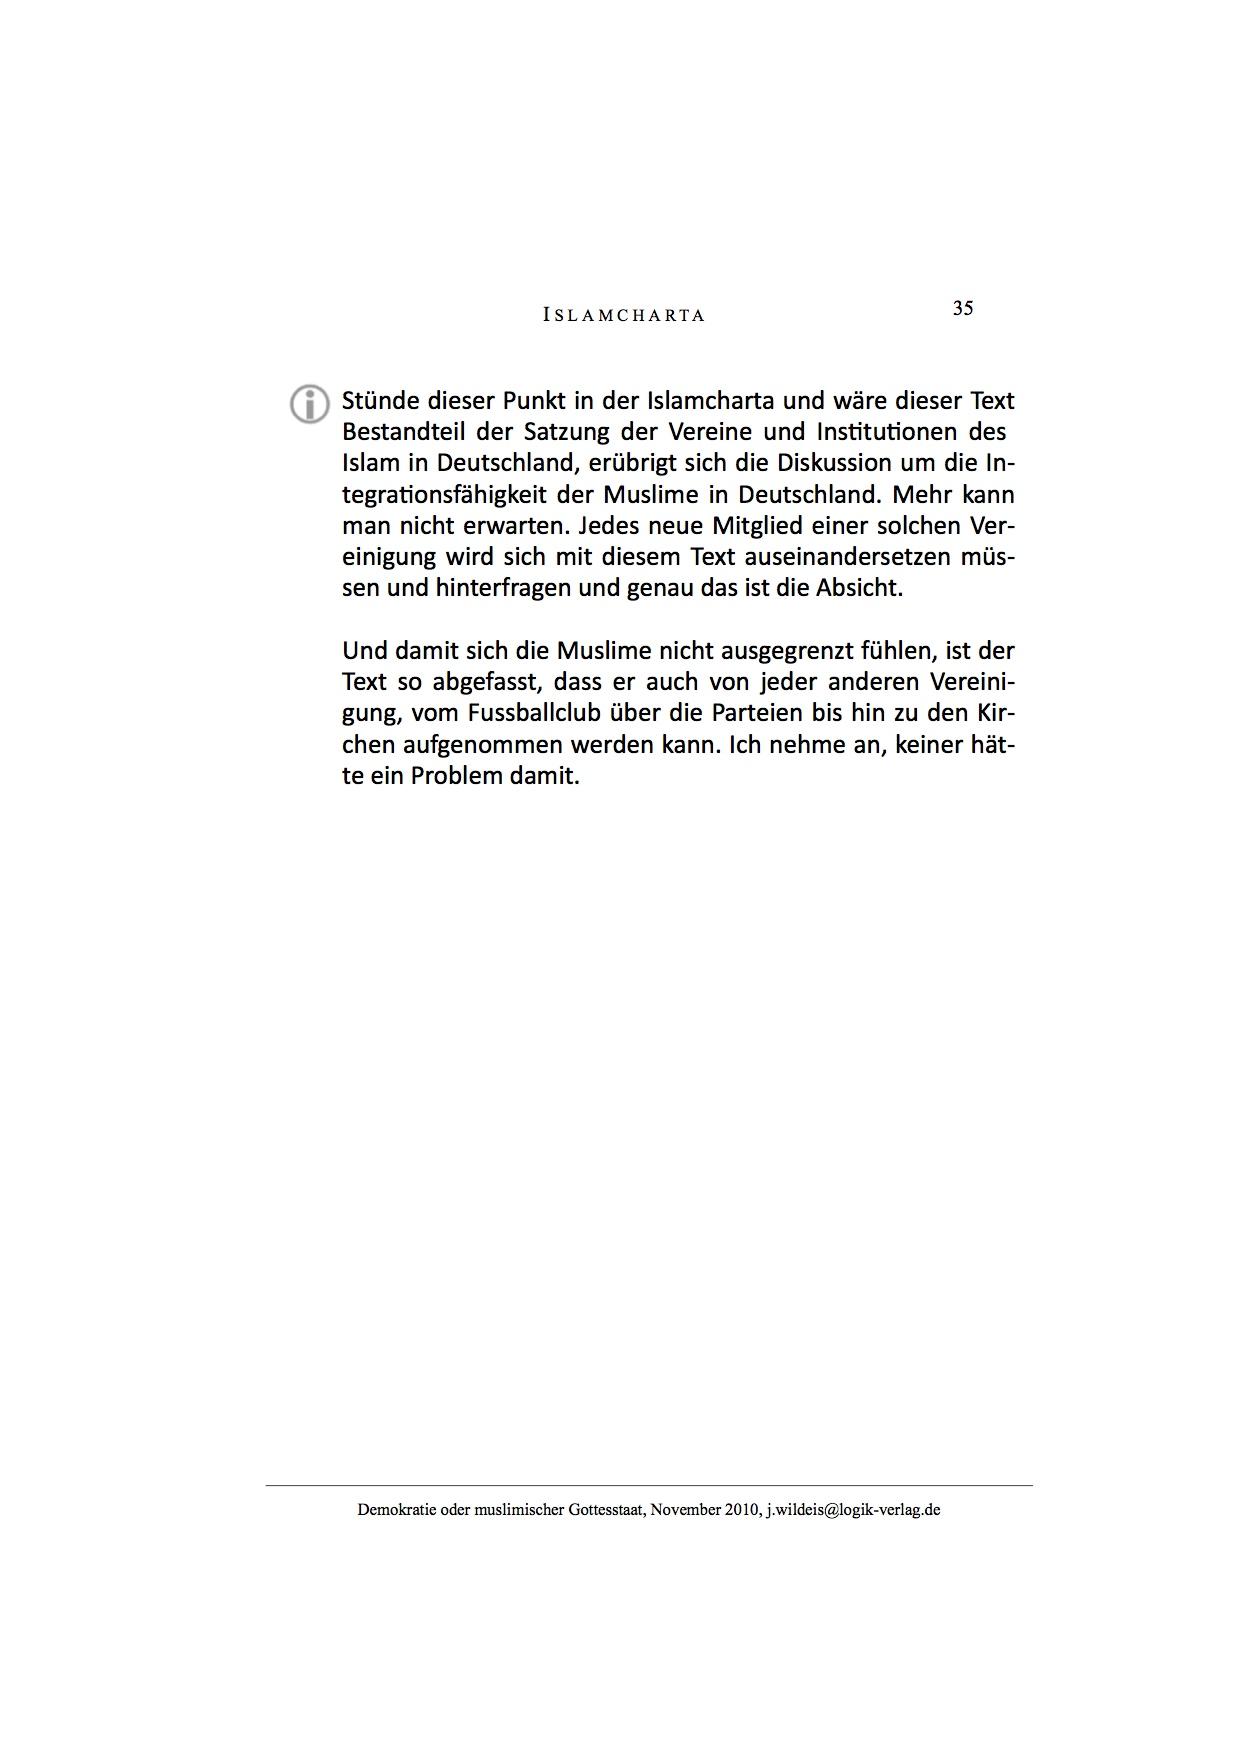 160625-Seite35